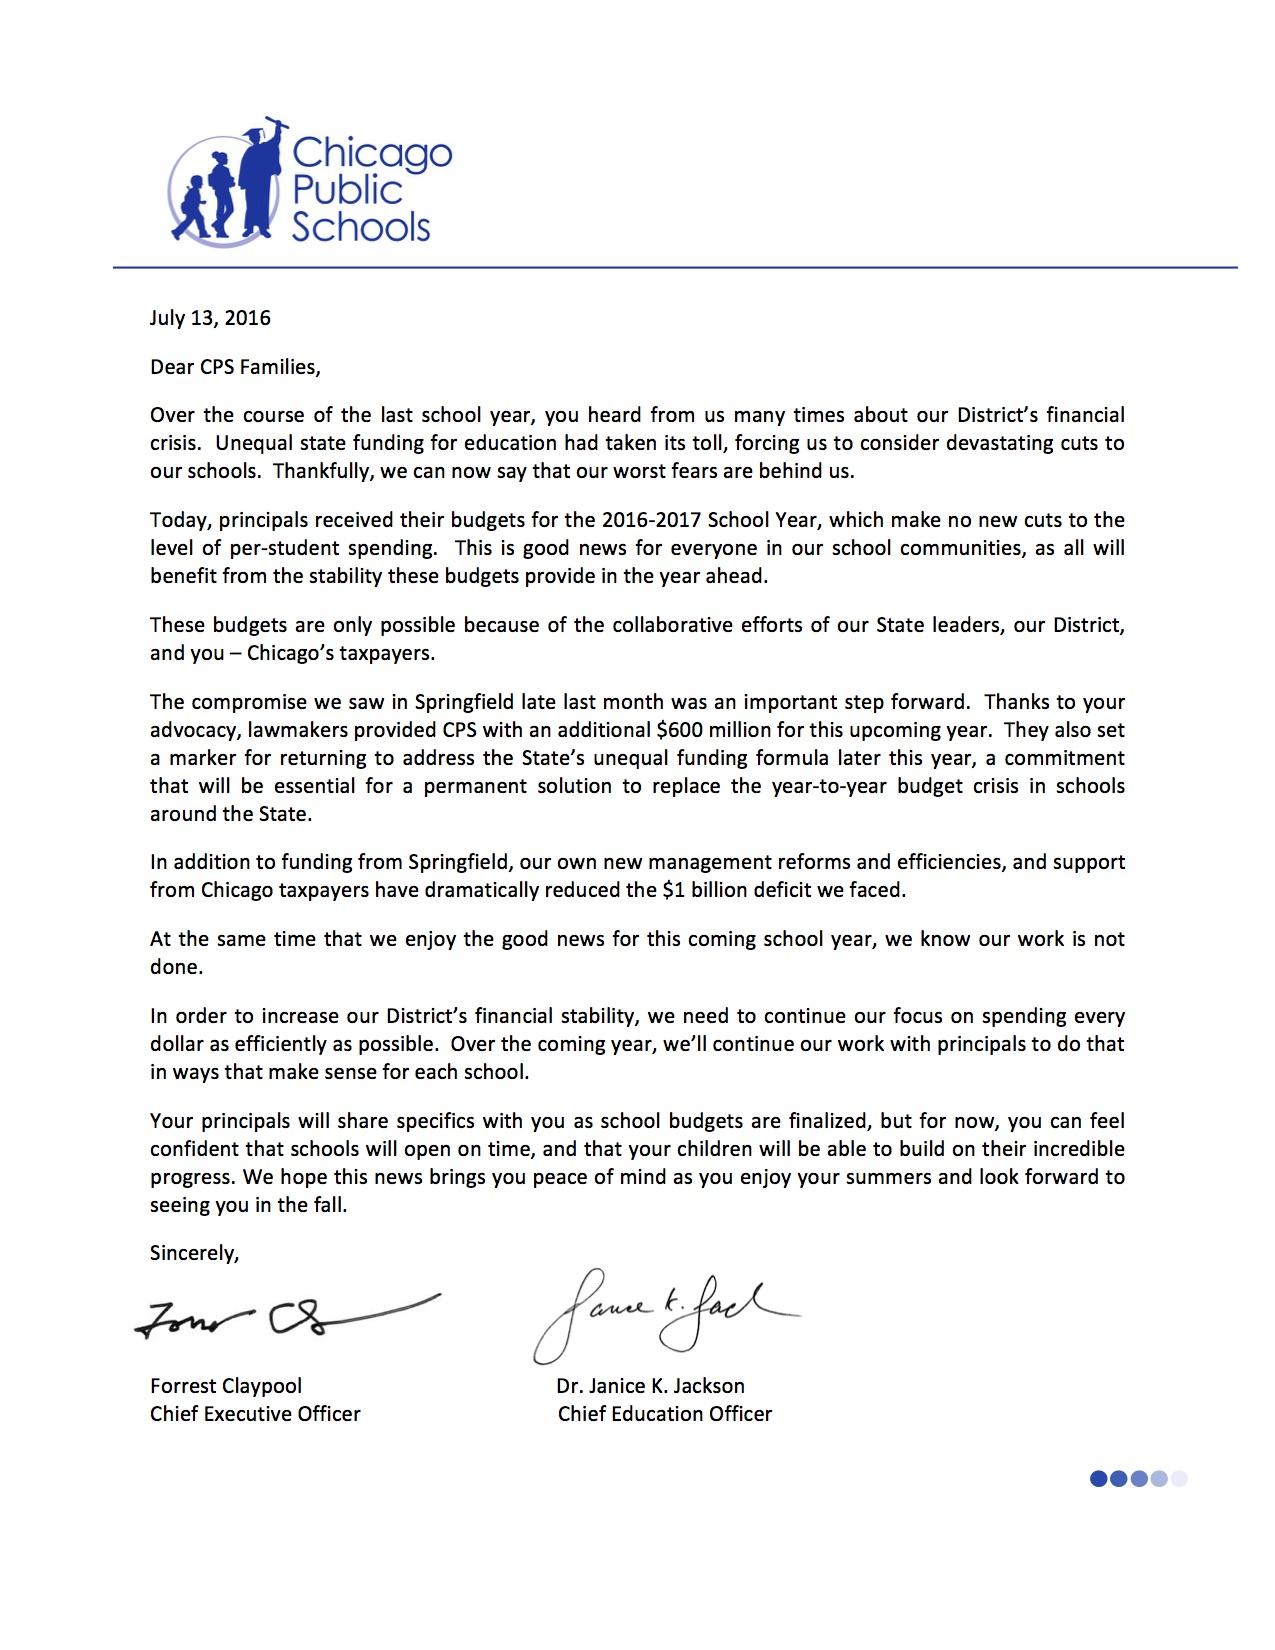 FY 17 Budget Stakeholder Letter (07.13.16)